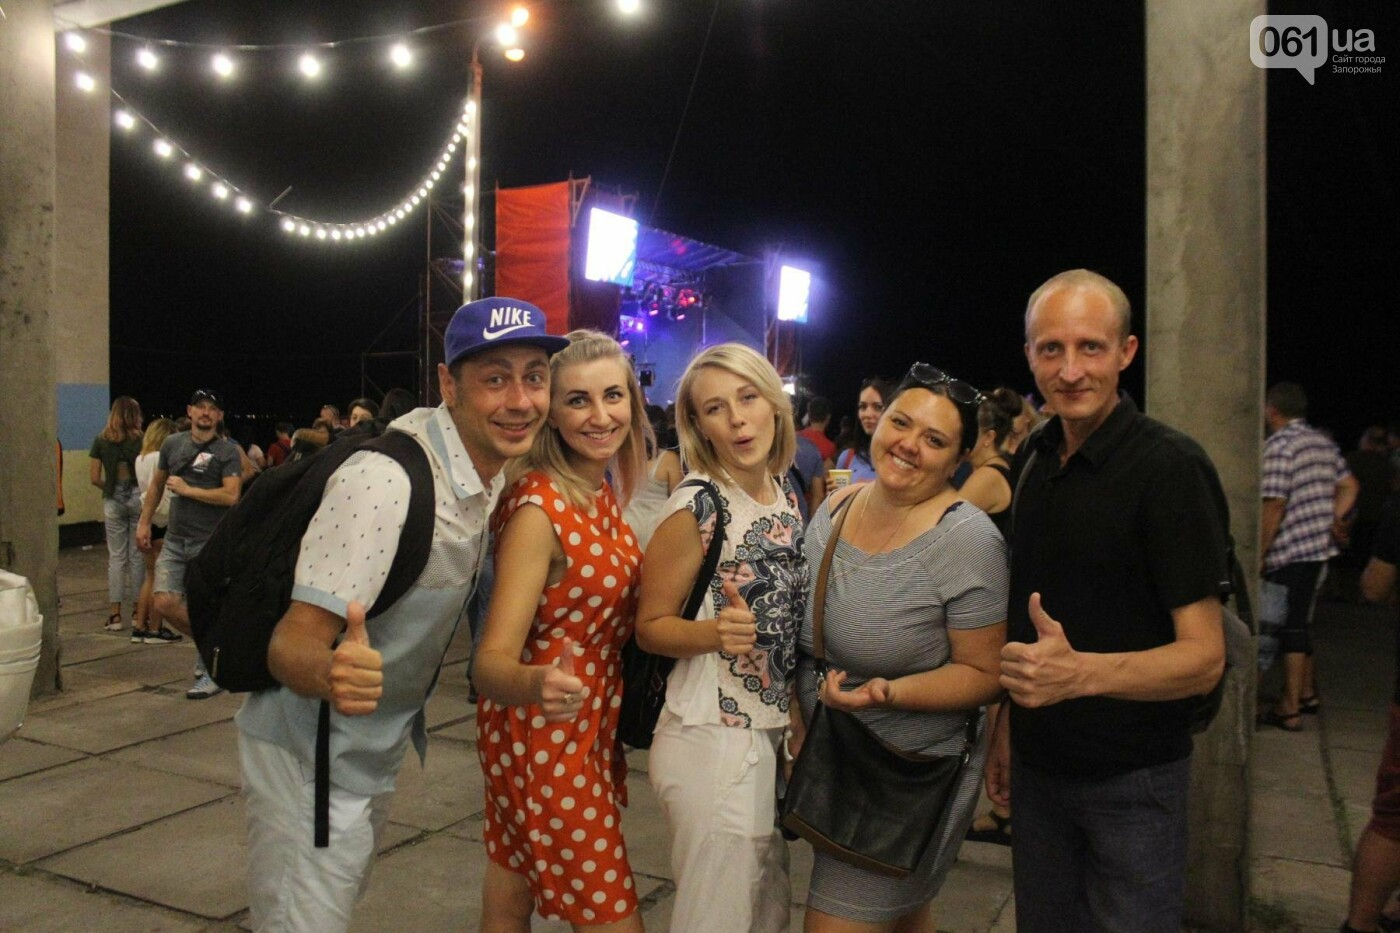 Найди себя: 50 портретов посетителей фестиваля Khortytsia Freedom, – ФОТОРЕПОРТАЖ, фото-49